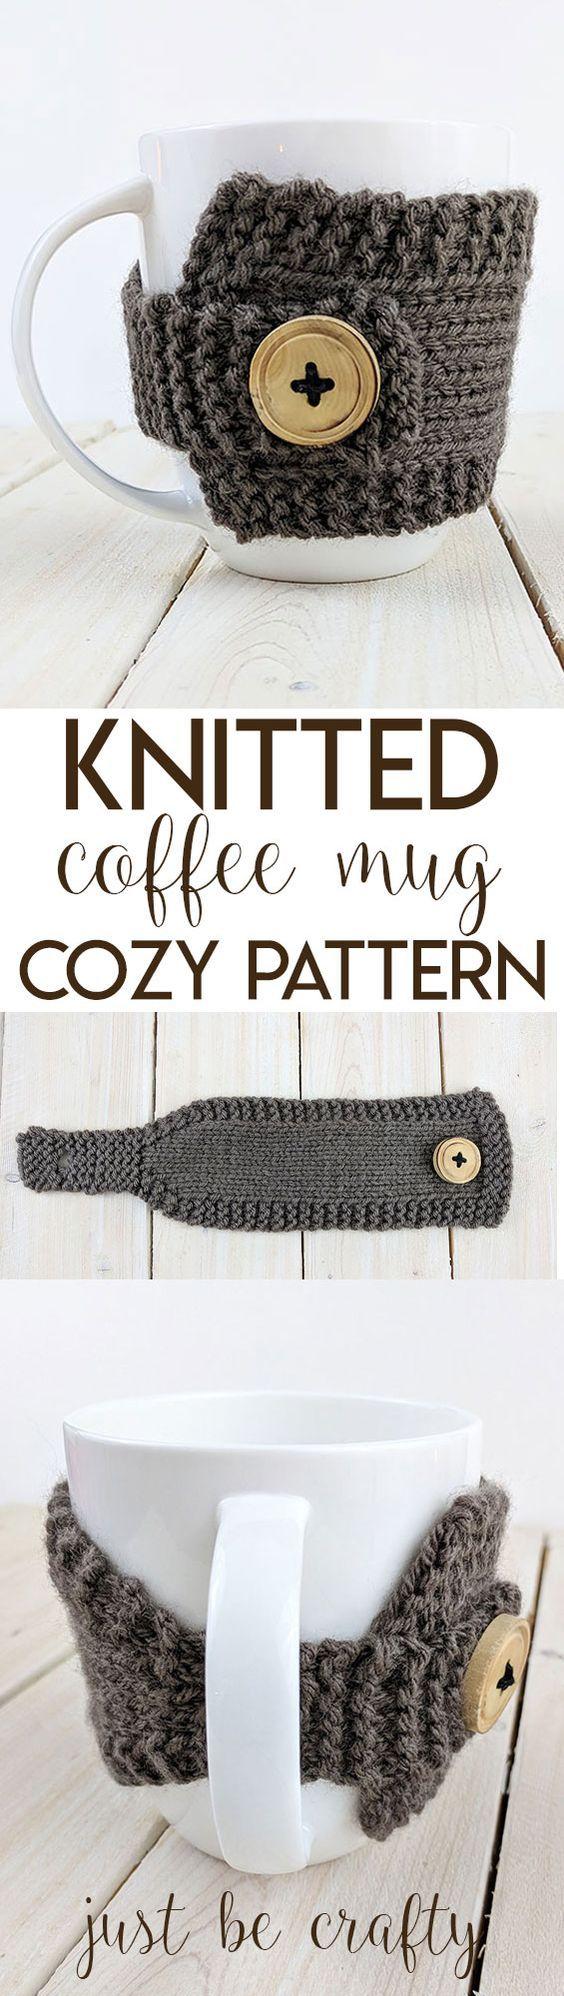 8 best knitting images on Pinterest | Patrones de punto, Tejer ...